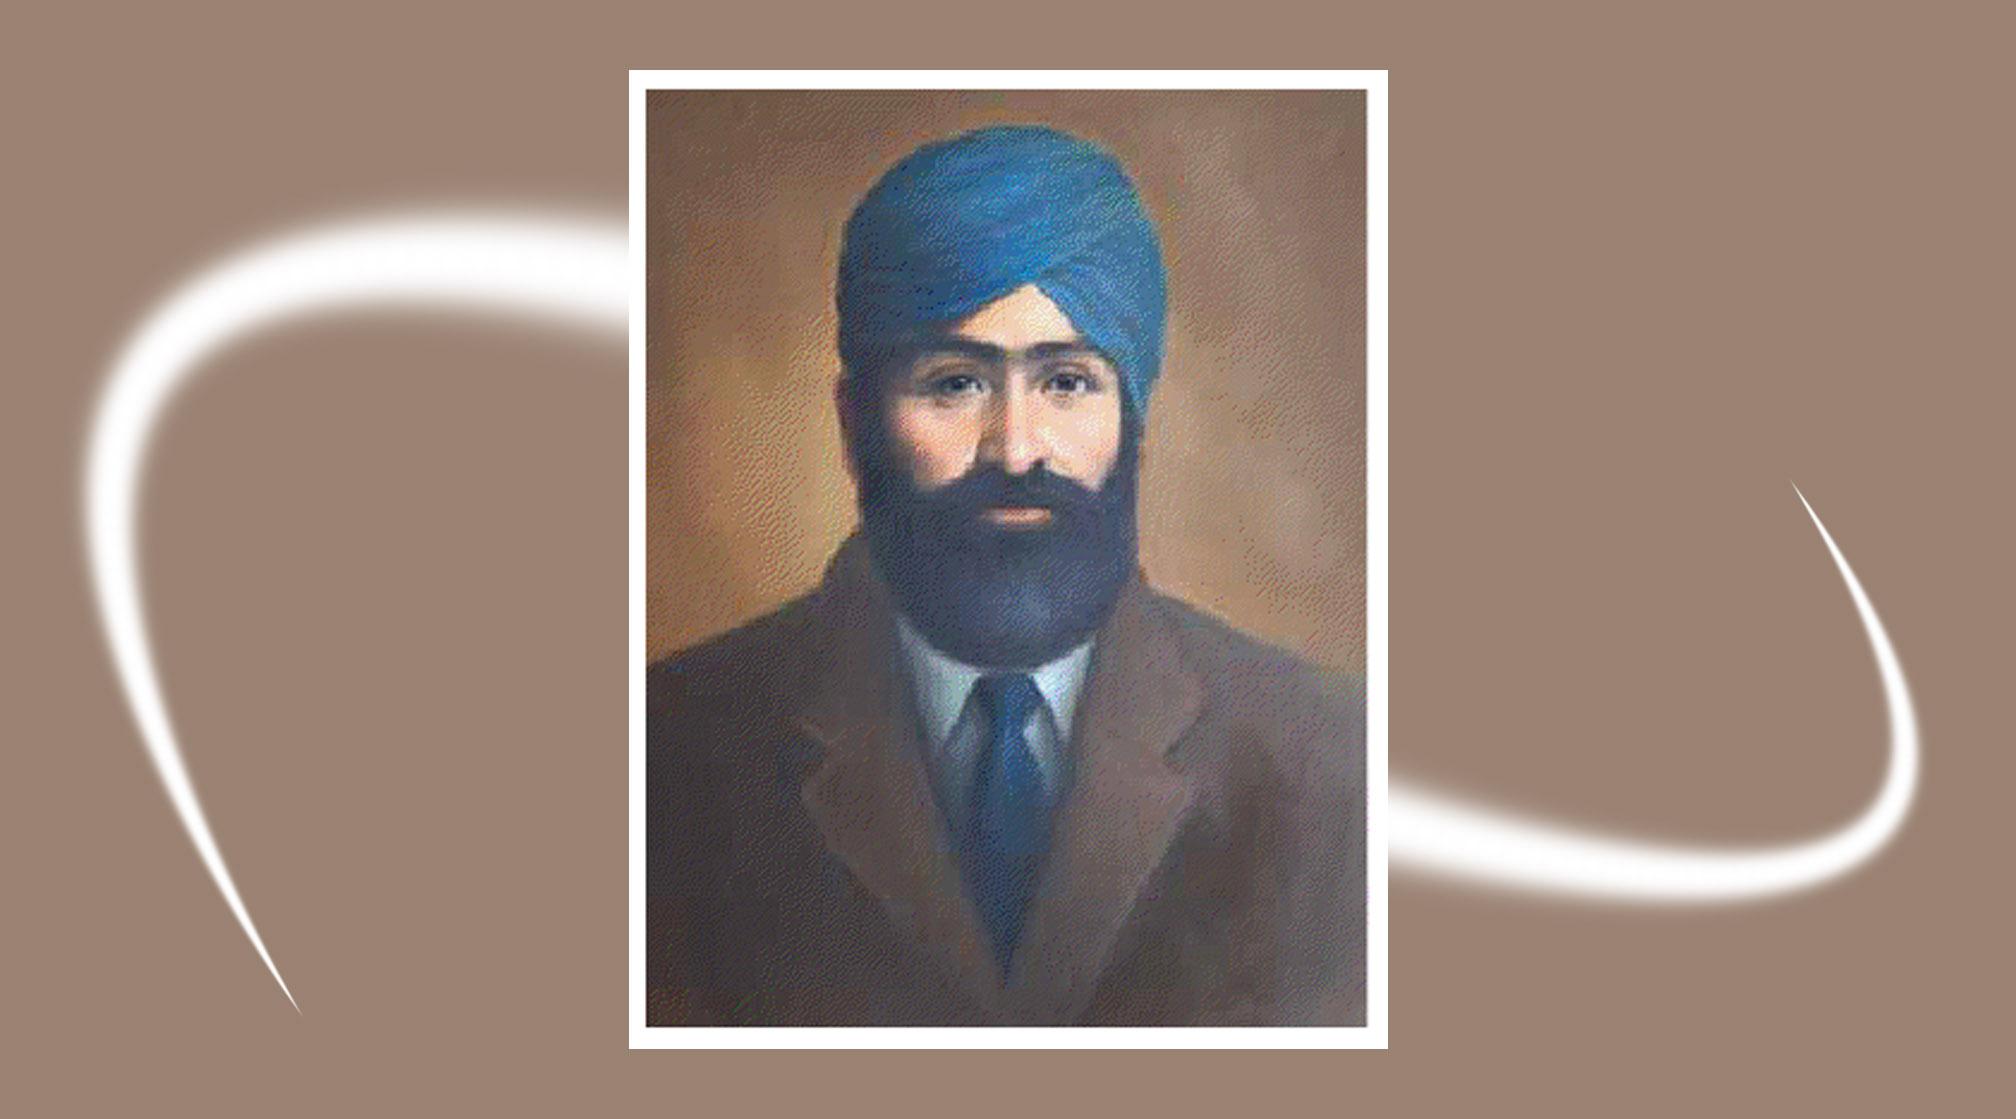 Bhai Mewa Singh 100 years